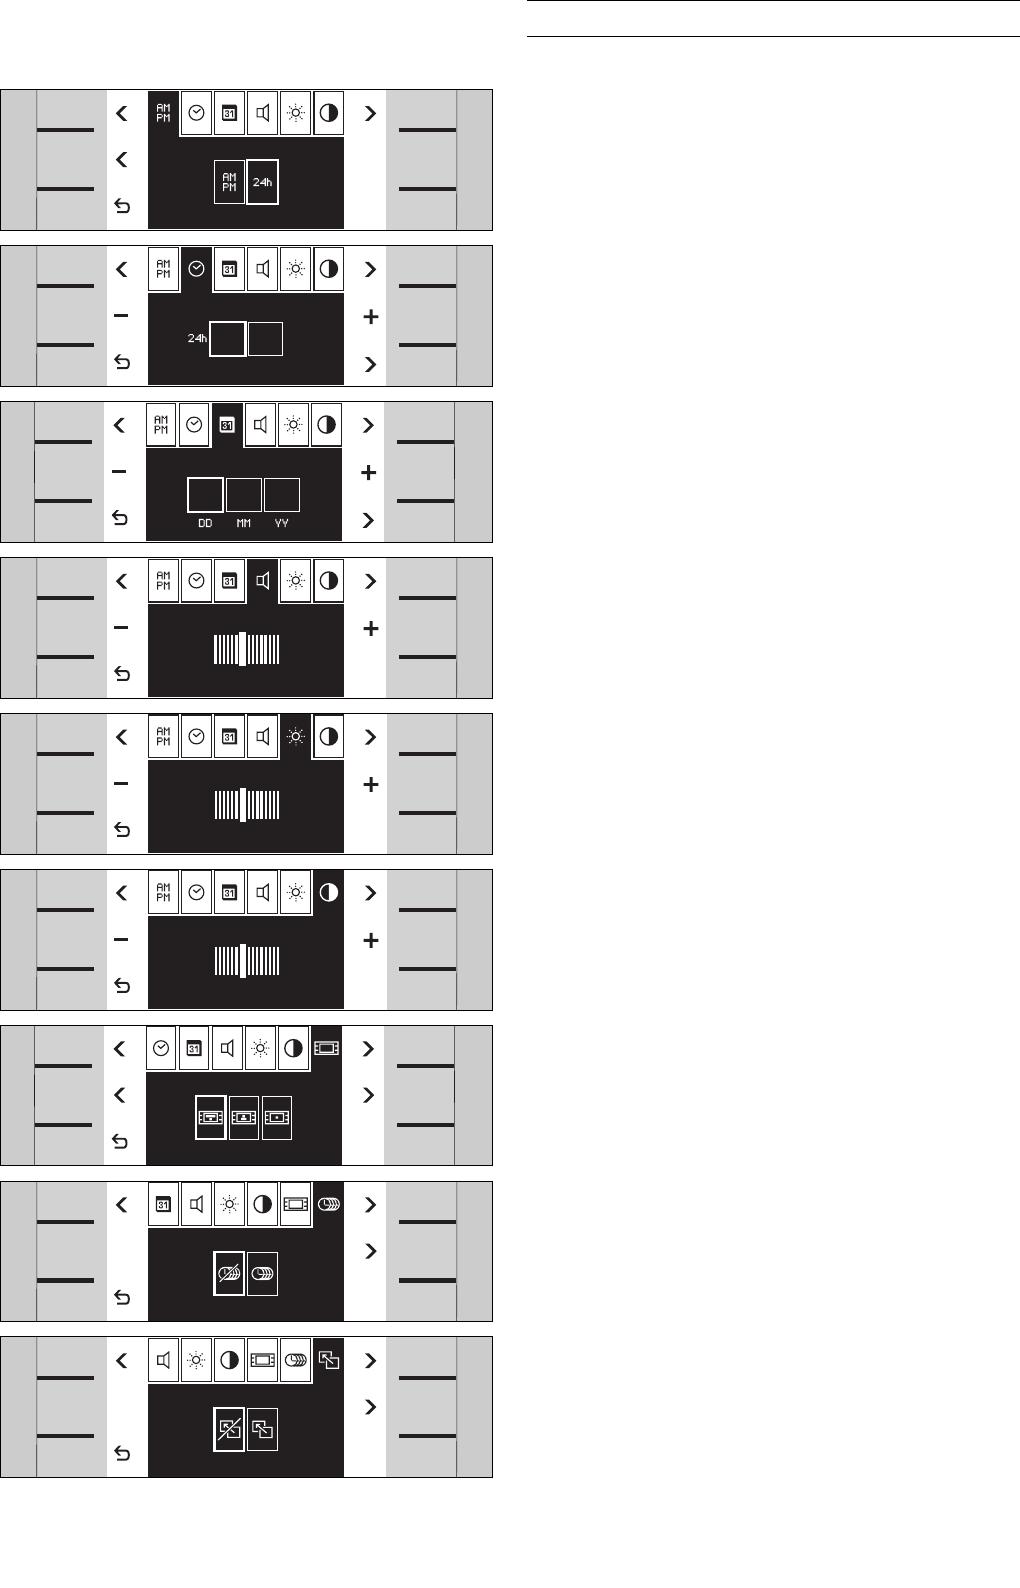 handleiding gaggenau bs 270 110 271 110 274 110 275 110 pagina 41 van 52 deutsch. Black Bedroom Furniture Sets. Home Design Ideas